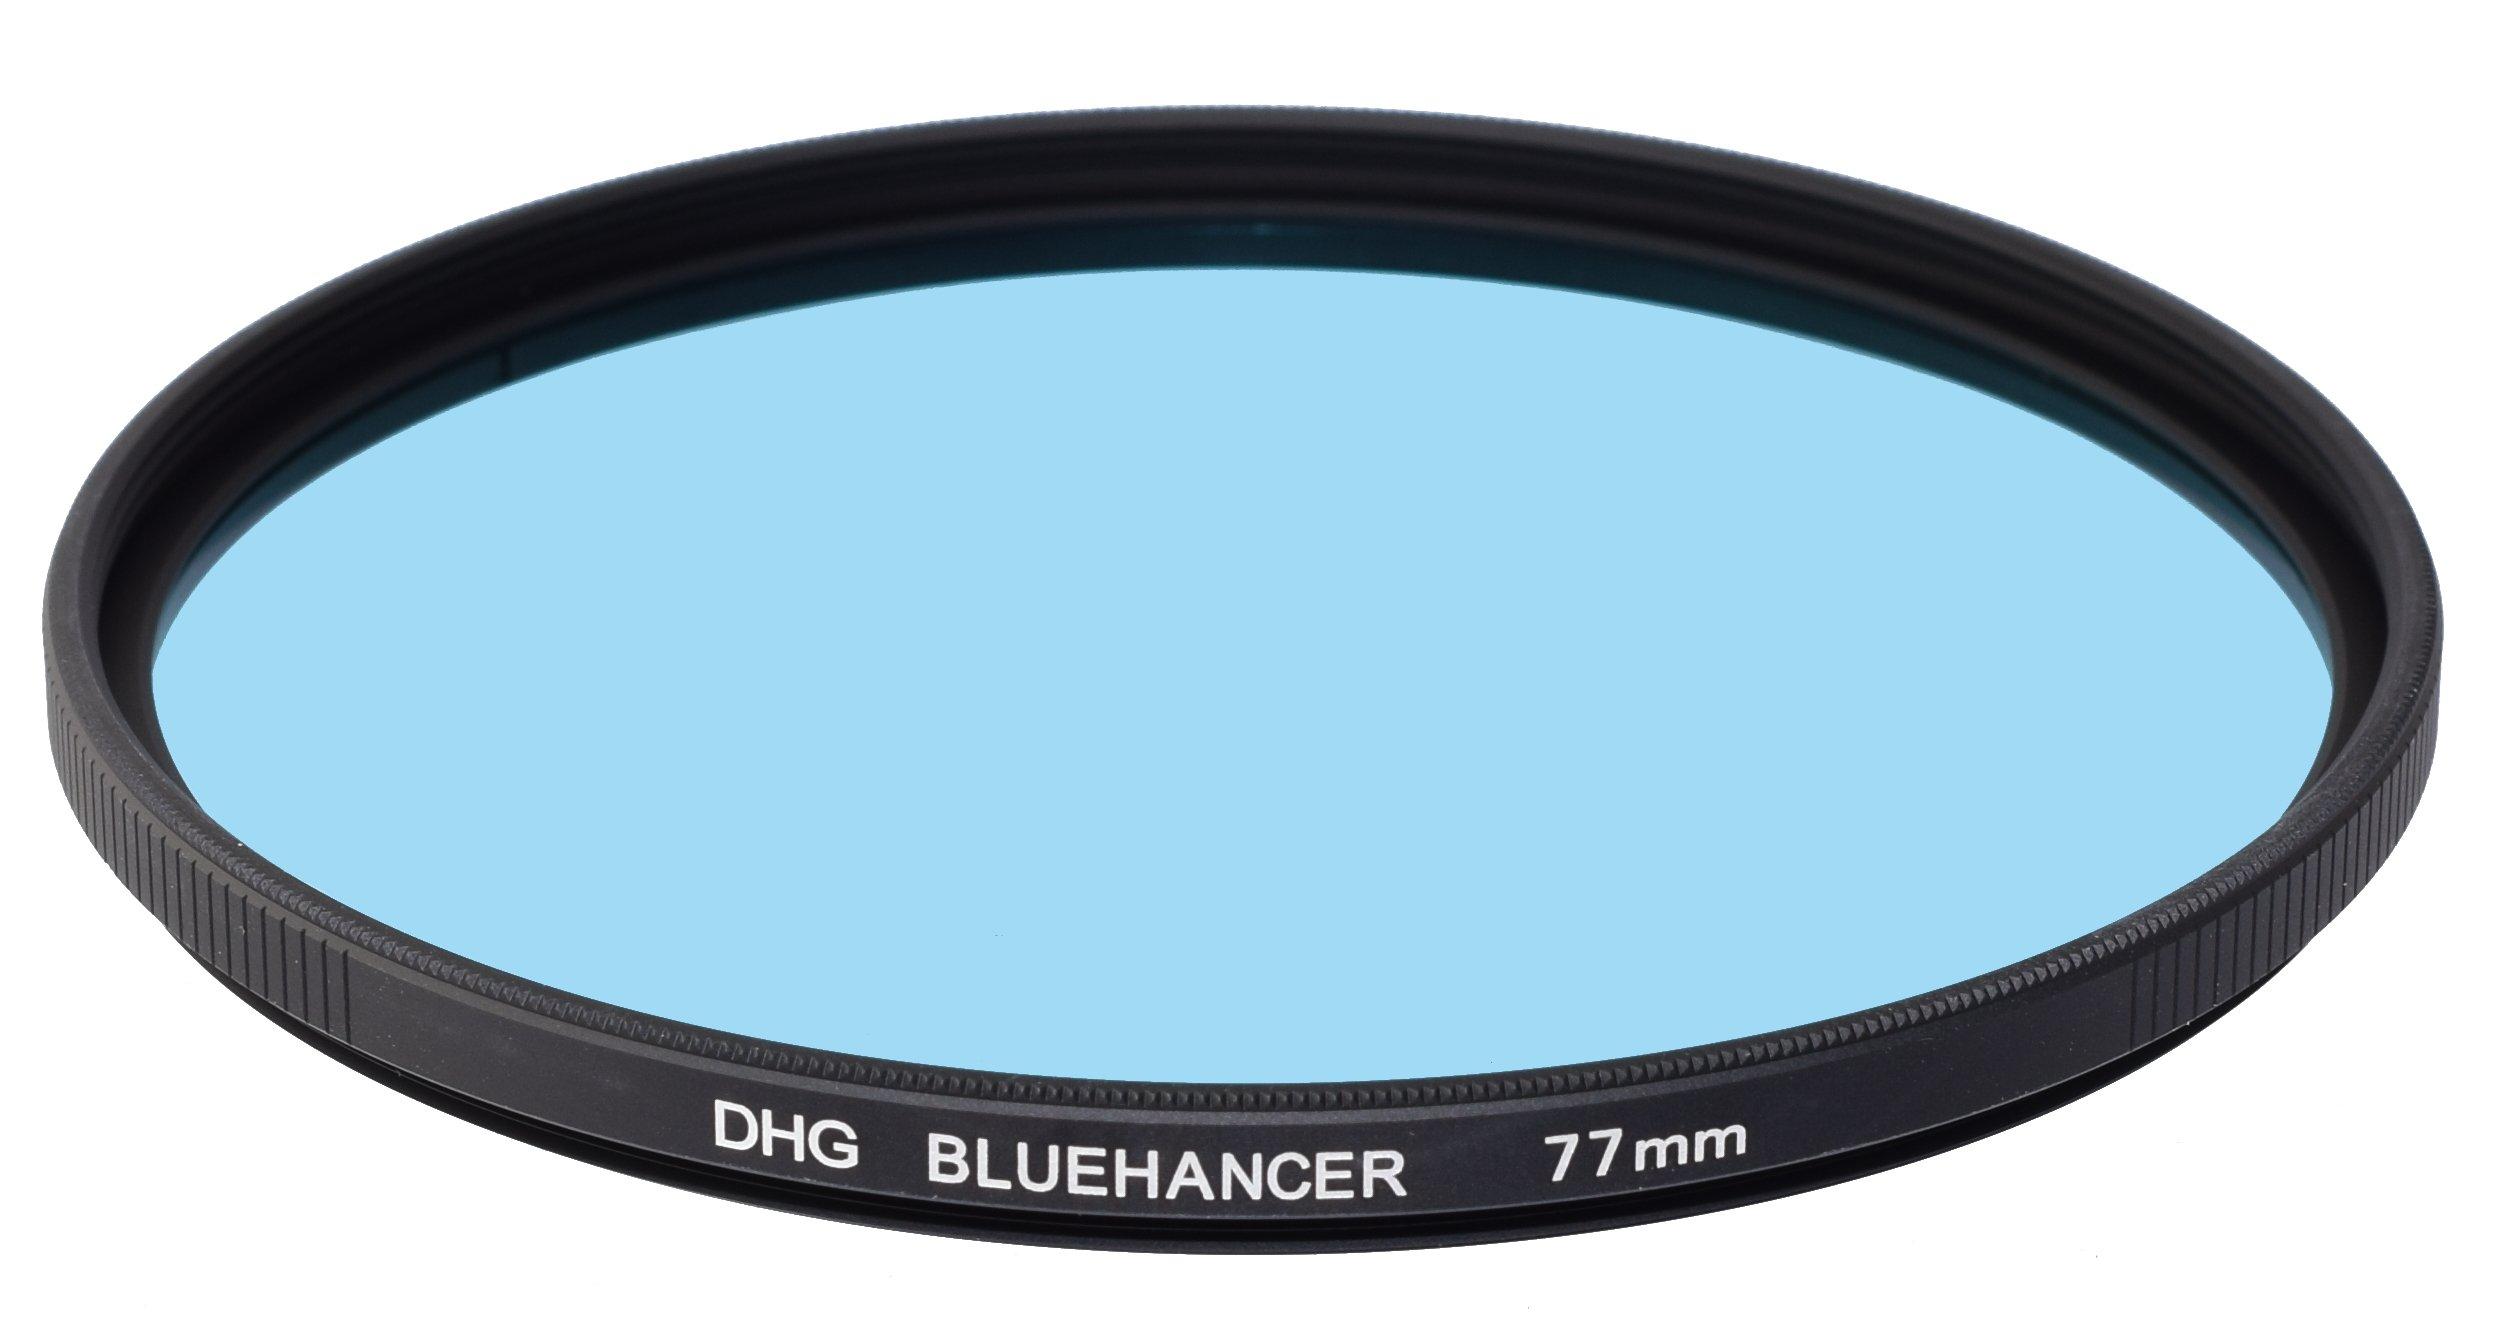 Marumi 77mm Bluehancer Light Pollution Filter DHG 77 Made in Japan